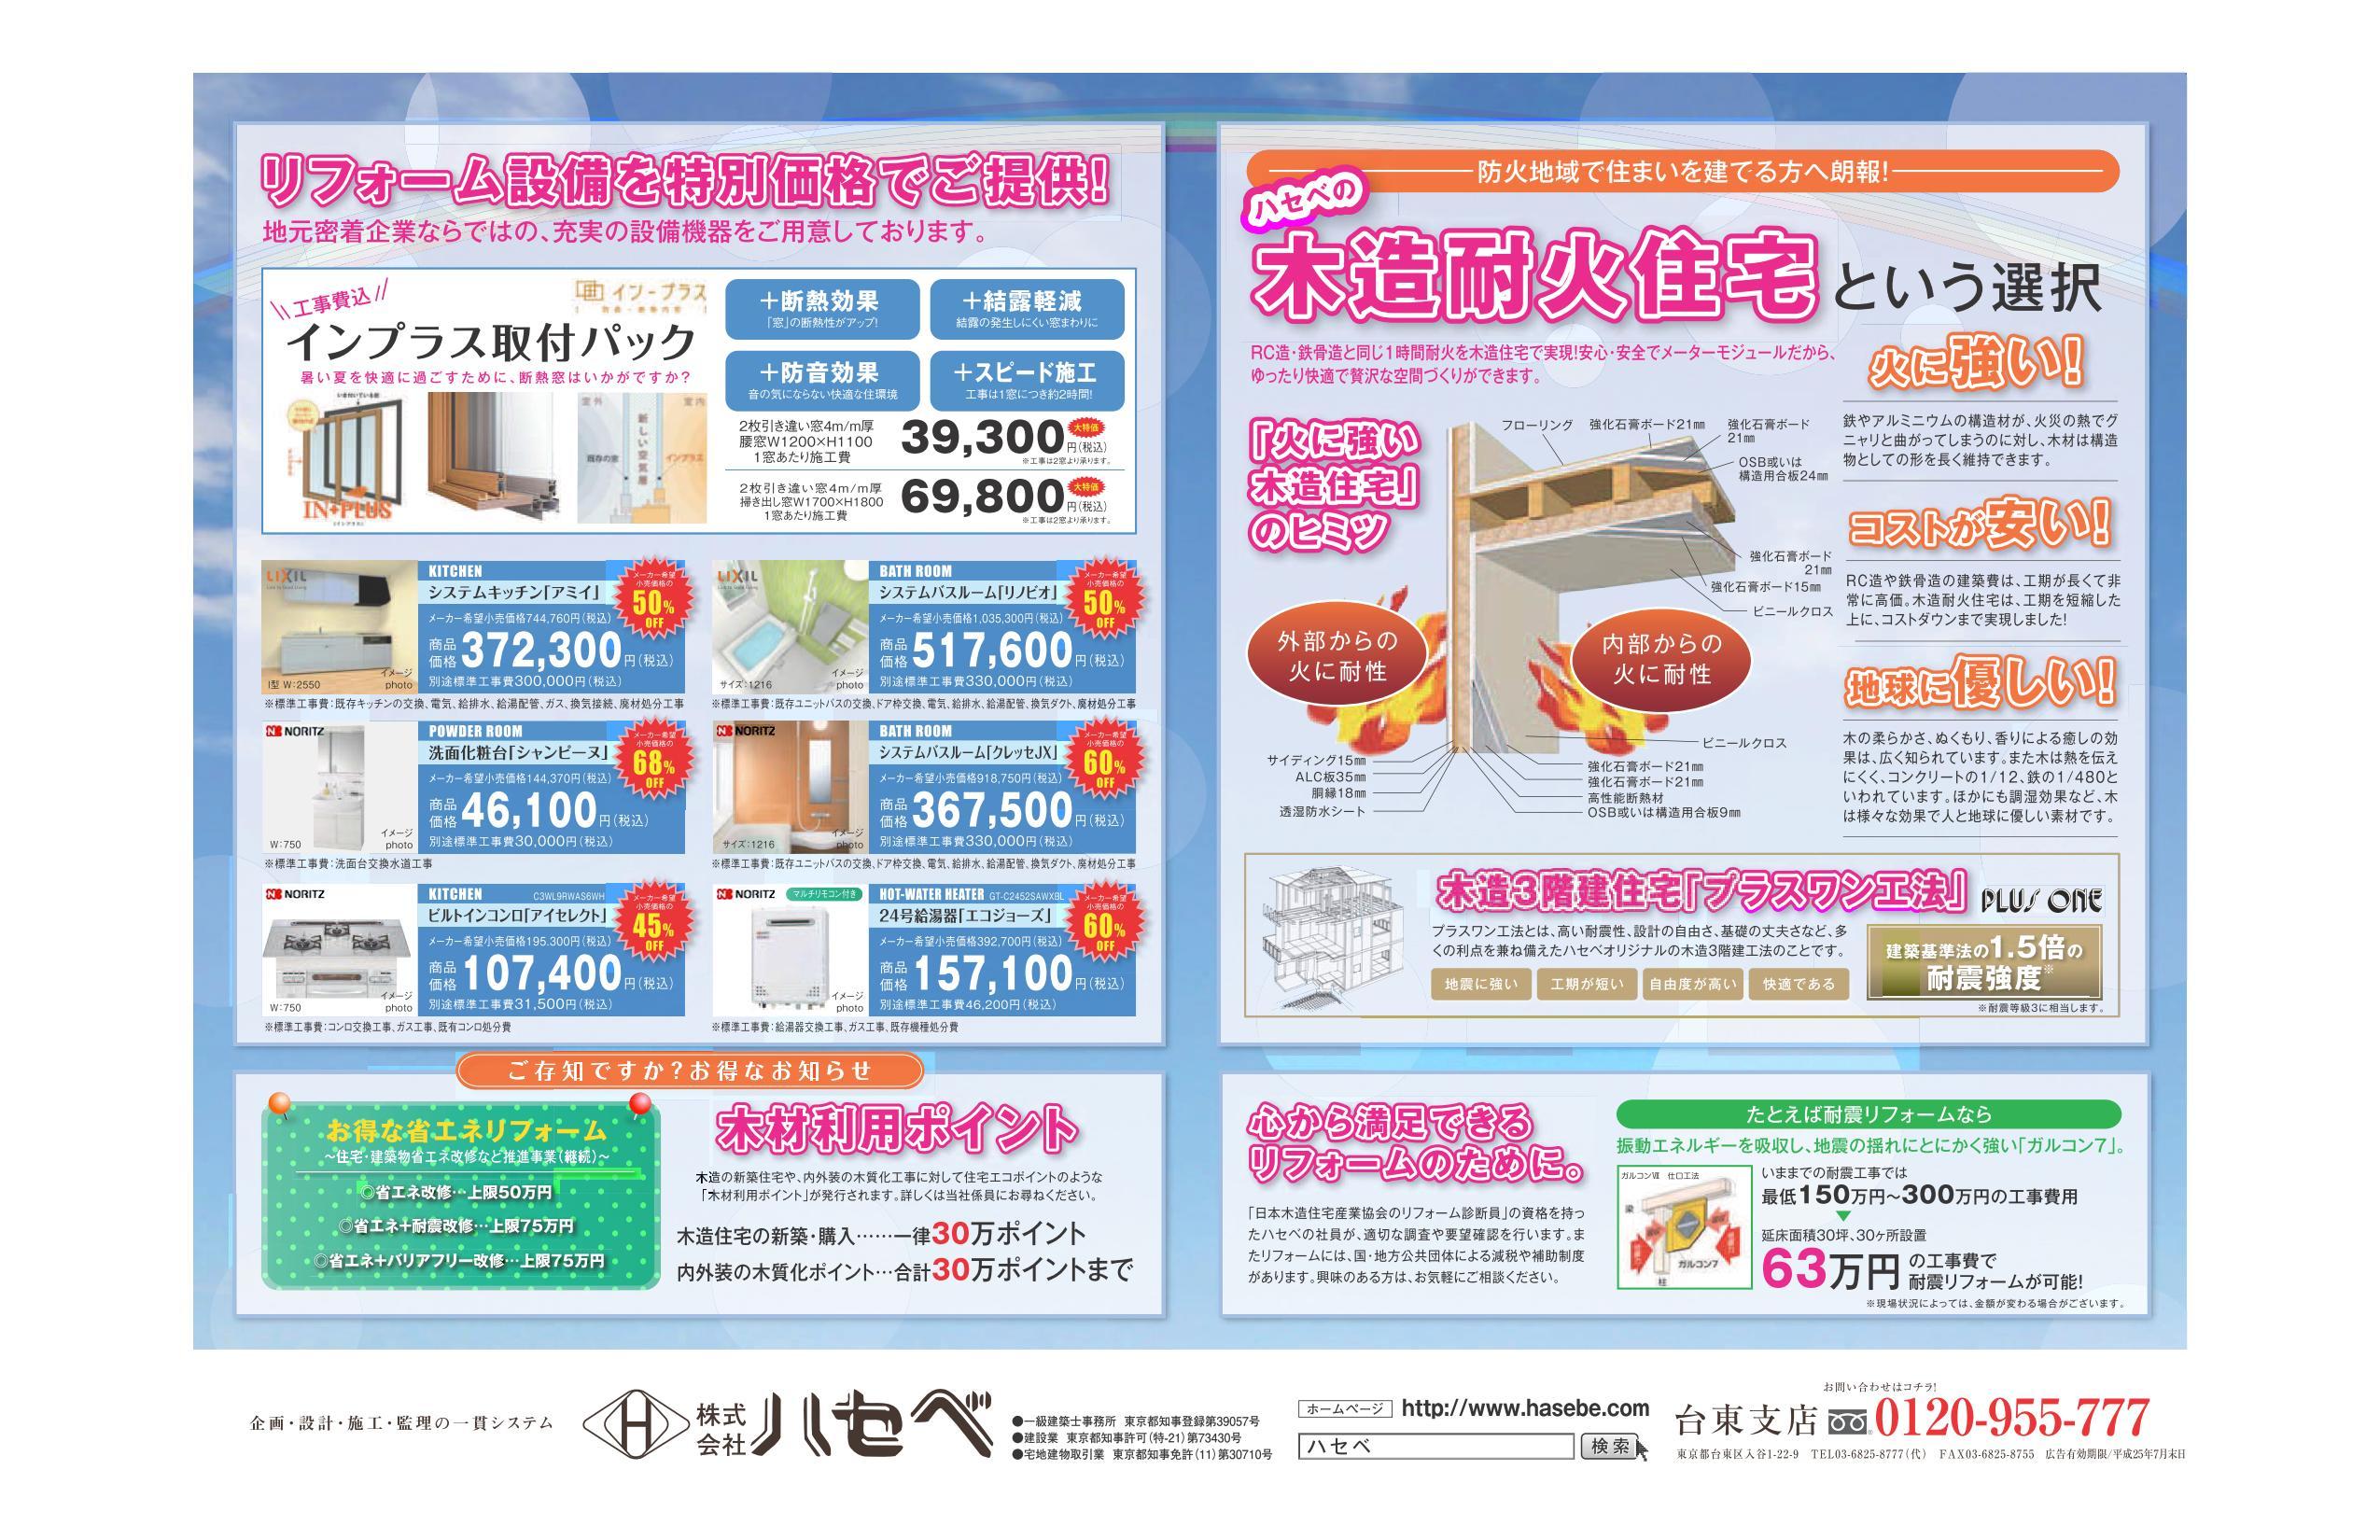 taitou-event_02.jpg